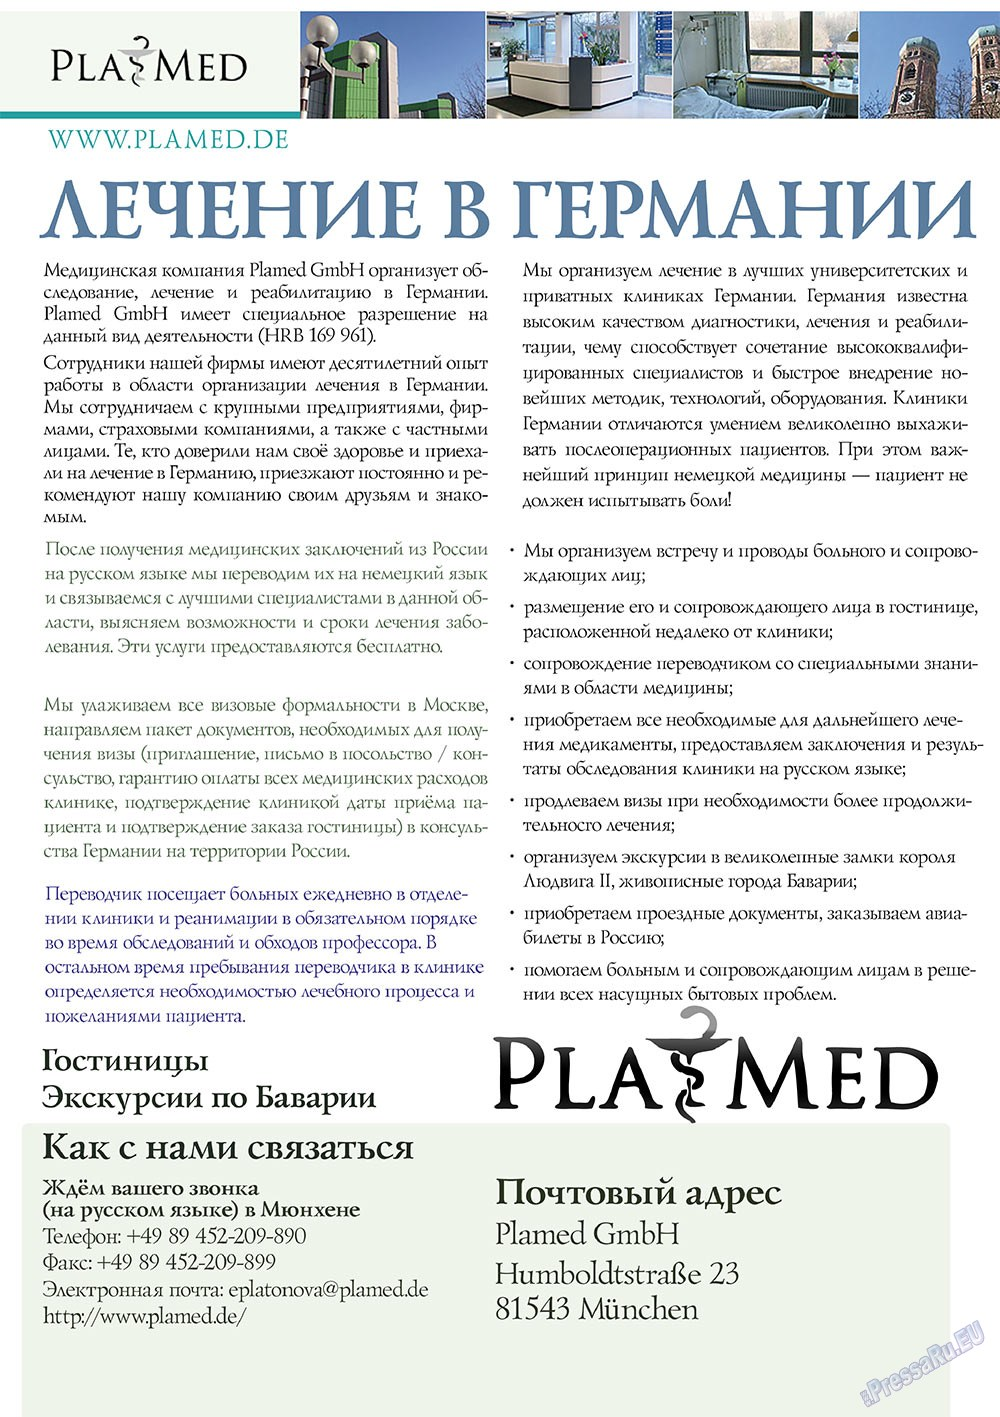 Бизнес парк (журнал). 2010 год, номер 3, стр. 16